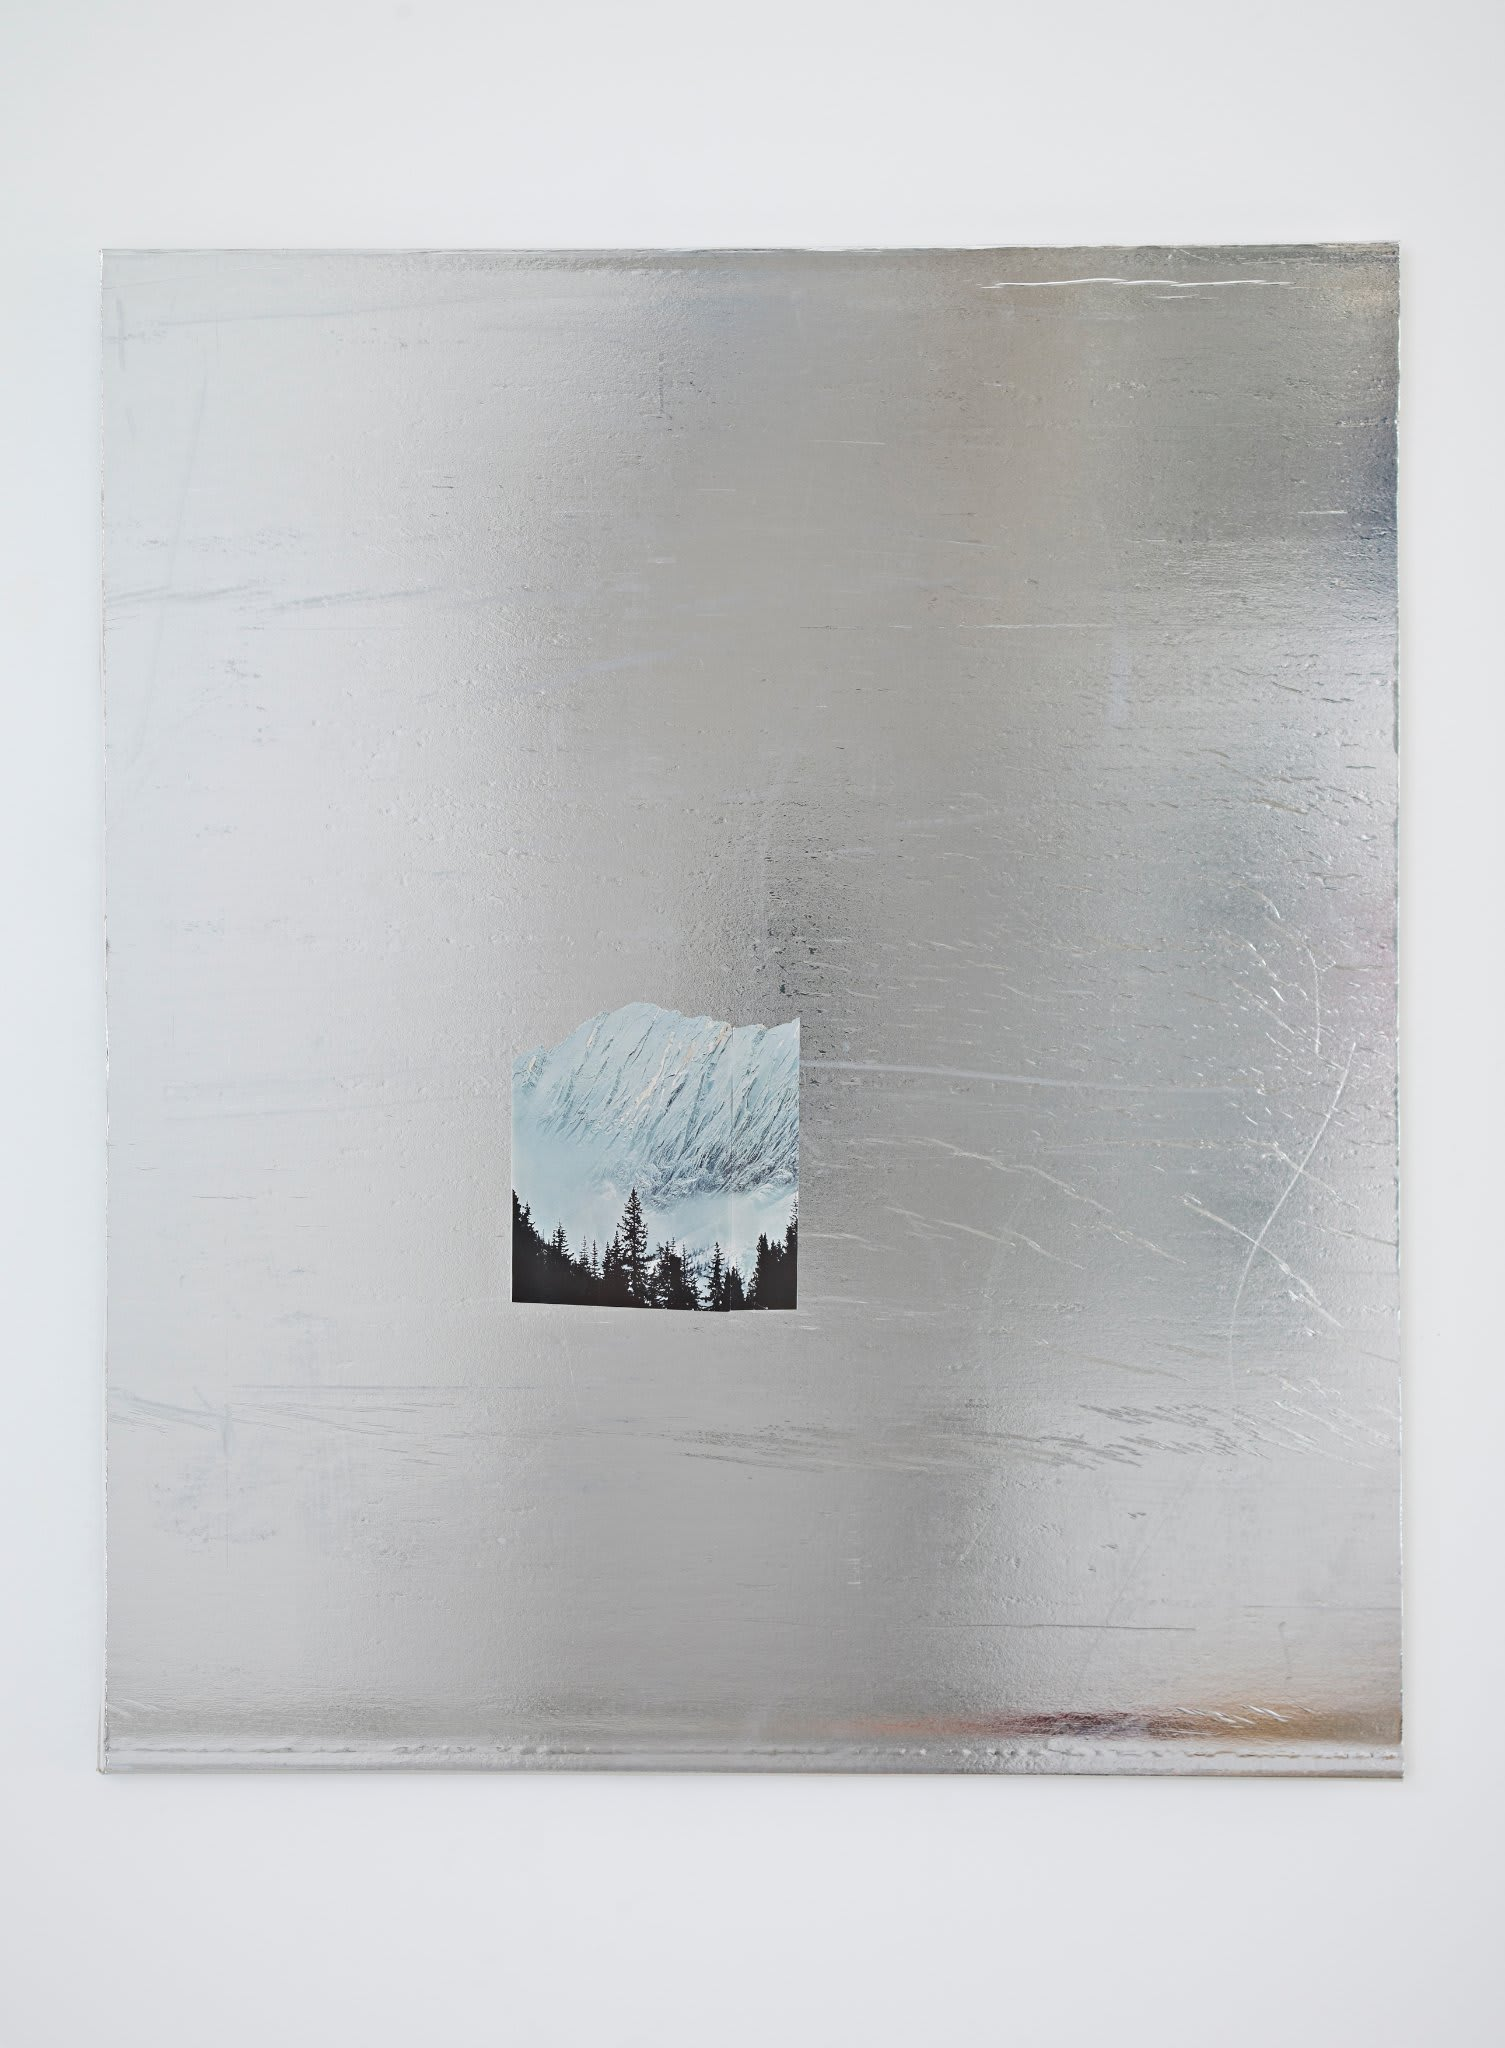 <span class=&#34;link fancybox-details-link&#34;><a href=&#34;/artists/16-paul-merrick/works/8250/&#34;>View Detail Page</a></span><div class=&#34;artist&#34;><strong>Paul Merrick</strong></div> <div class=&#34;title&#34;><em>Untitled (Wonderland)</em>, 2013</div> <div class=&#34;medium&#34;>Insulation plasterboard, found image, dressmaker pins</div> <div class=&#34;dimensions&#34;>100 x 120 cm<br />39 3/8 x 47 1/4 in</div><div class=&#34;copyright_line&#34;>Copyright The Artist</div>